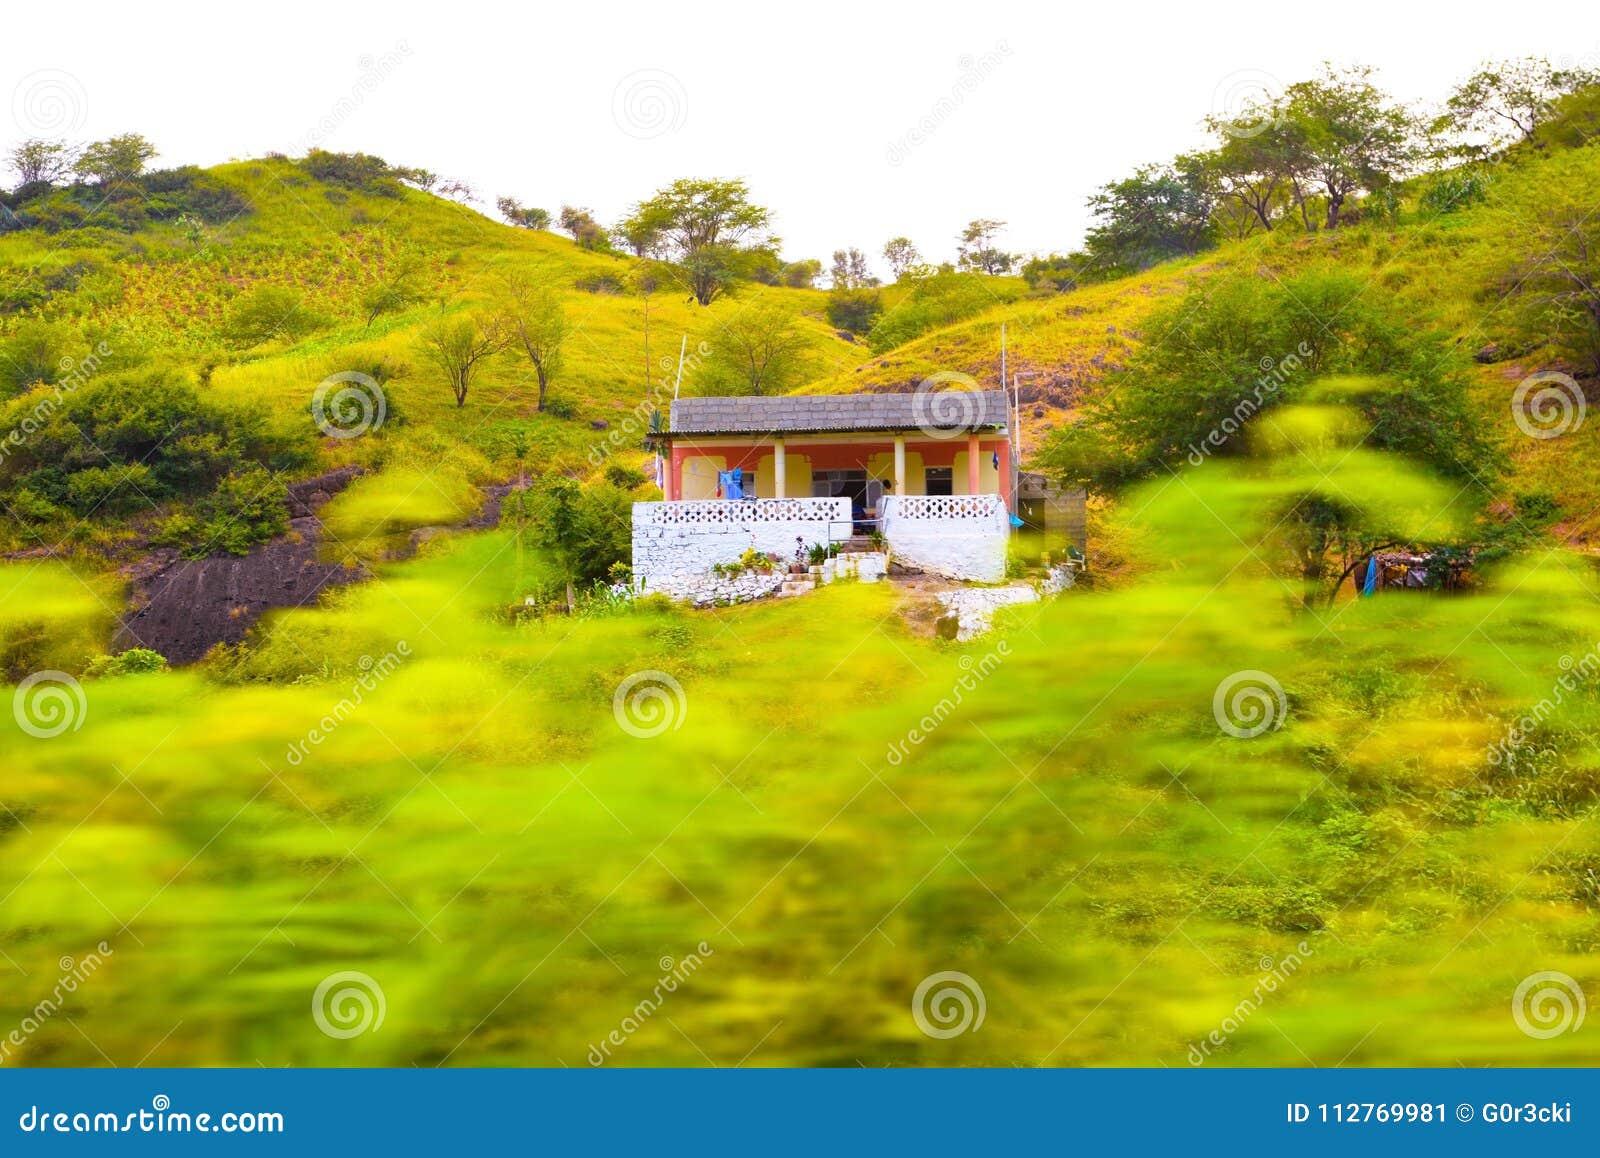 Cape Verde, Small House, Volcanic and Fertile Landscape, Mountains Scenery, Santiago Island